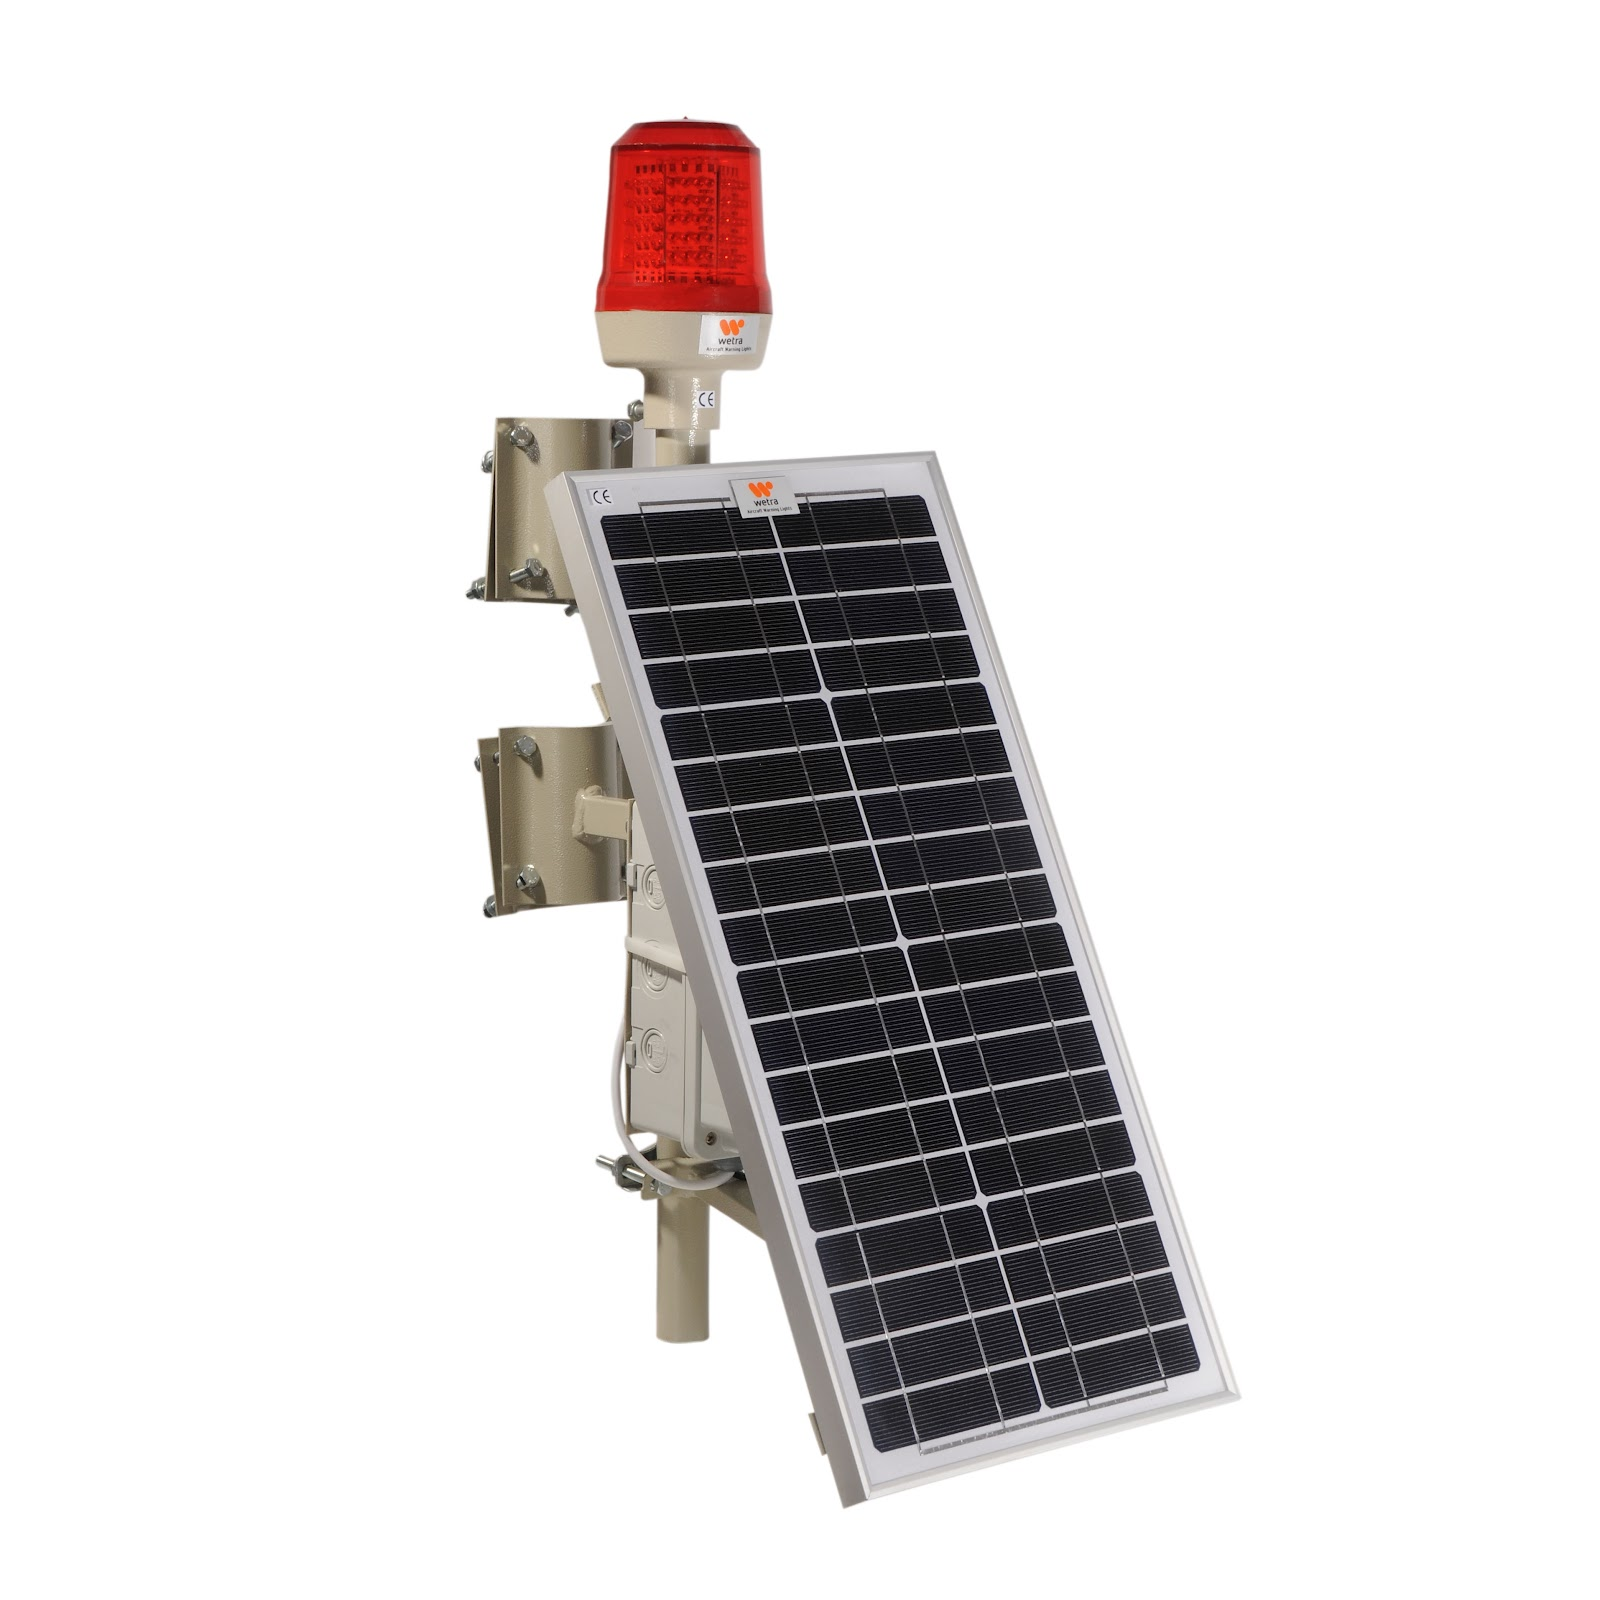 güneş enerjili kırmızı flaşörlü uçak ikaz lambası